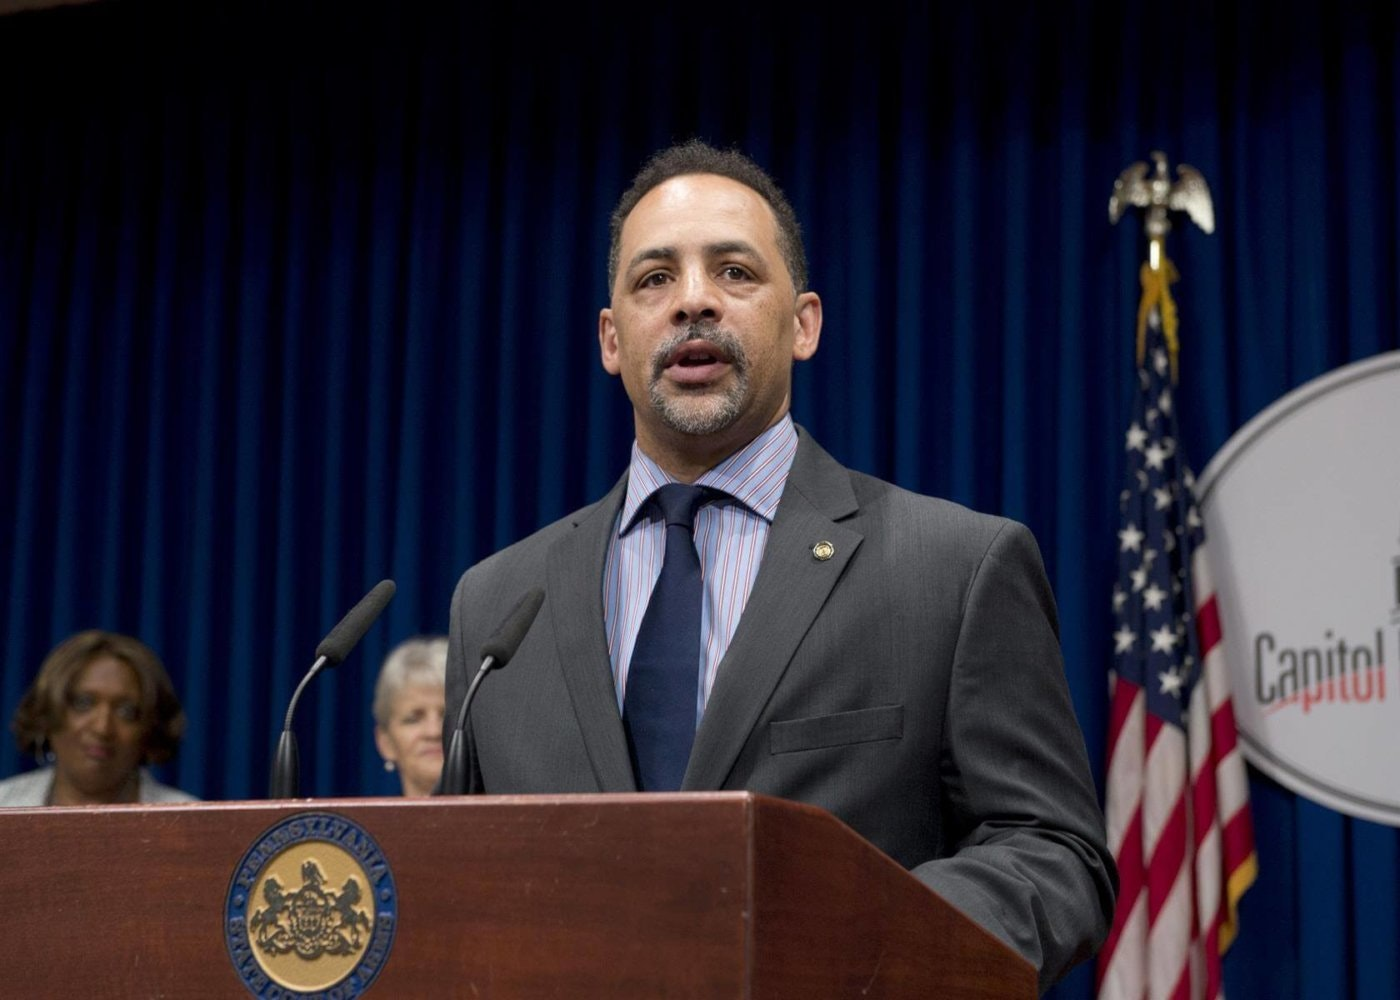 State Rep. Chris Rabb (Courtesy of Pennsylvania House of Representatives)